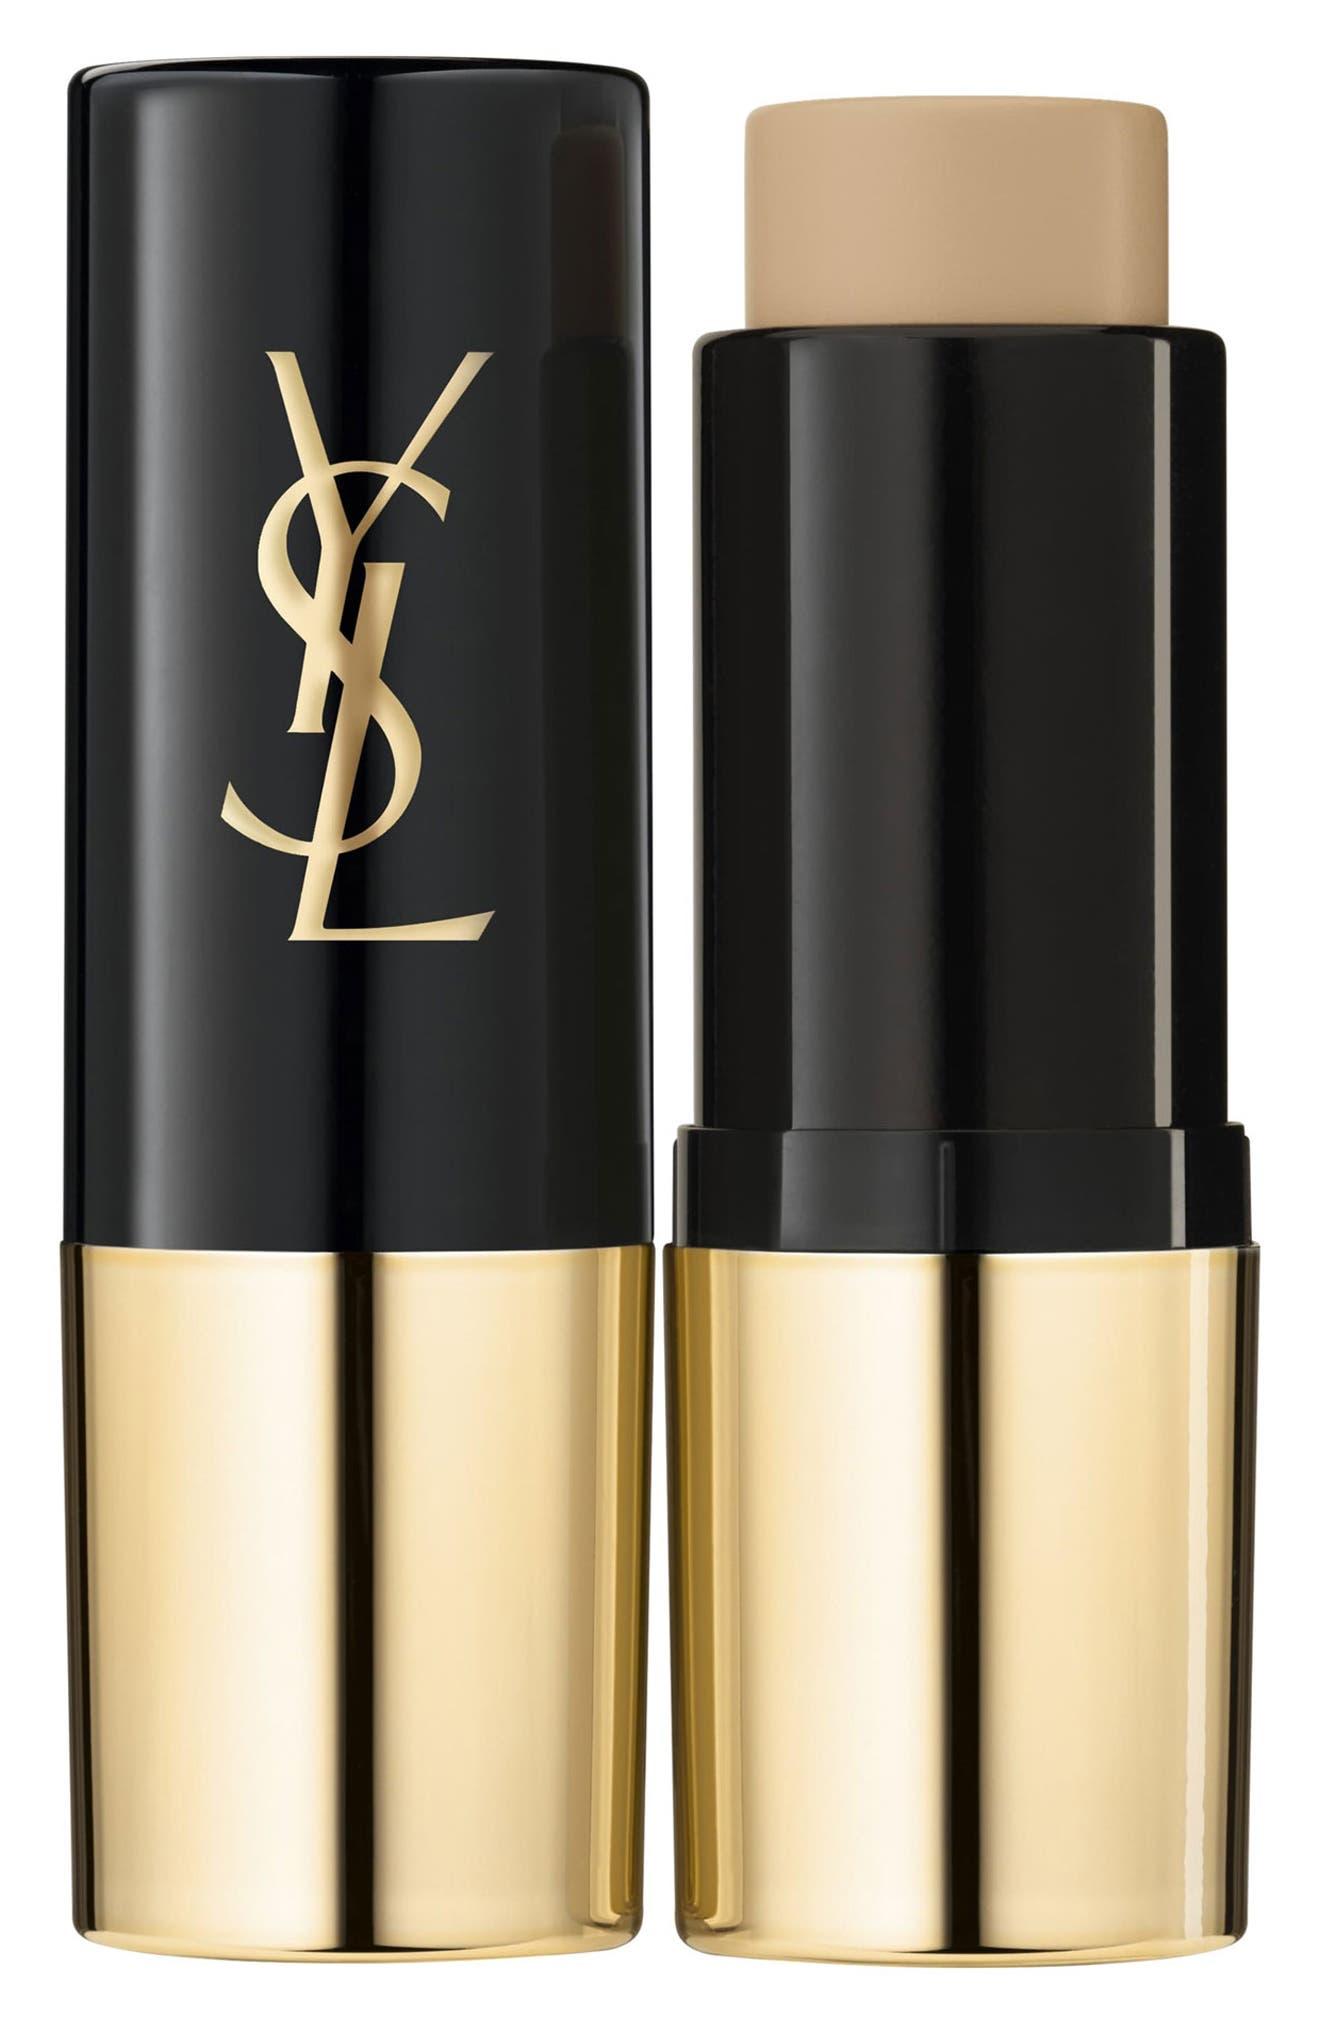 Yves Saint Laurent All Hours Foundation Stick - B20 Ivory